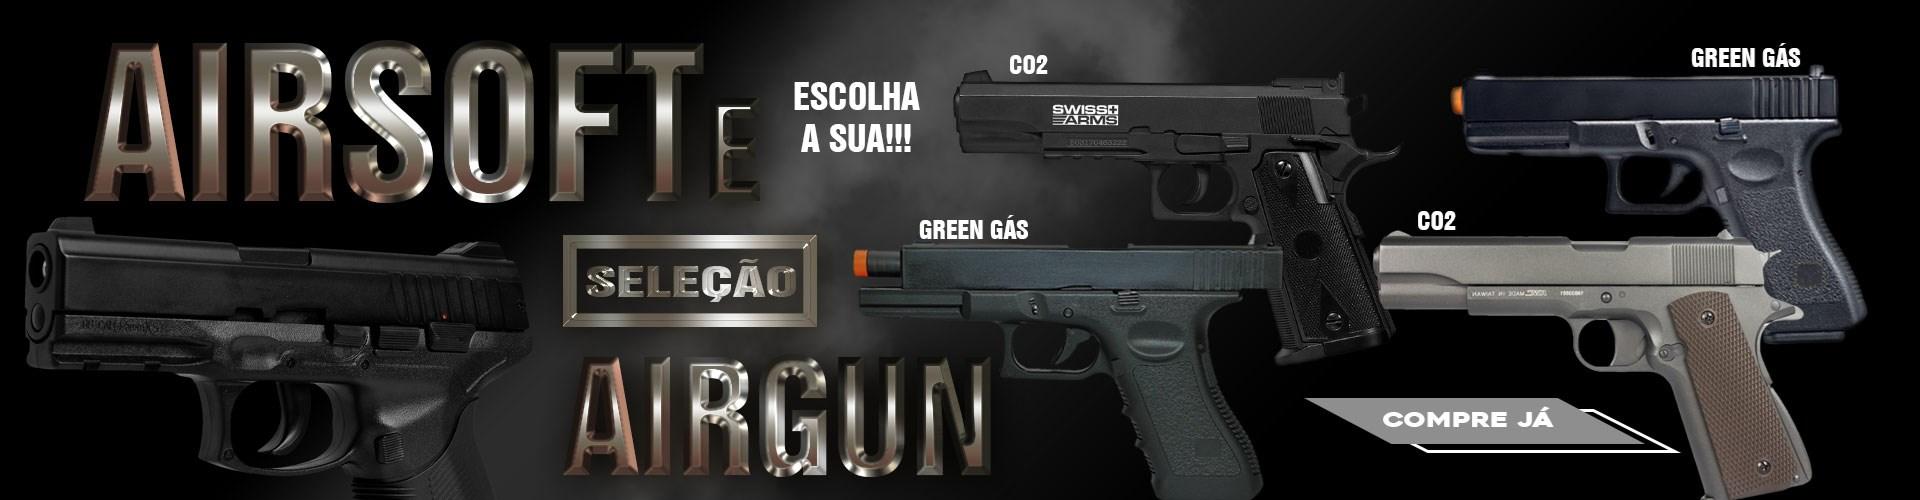 Banner Pistolas